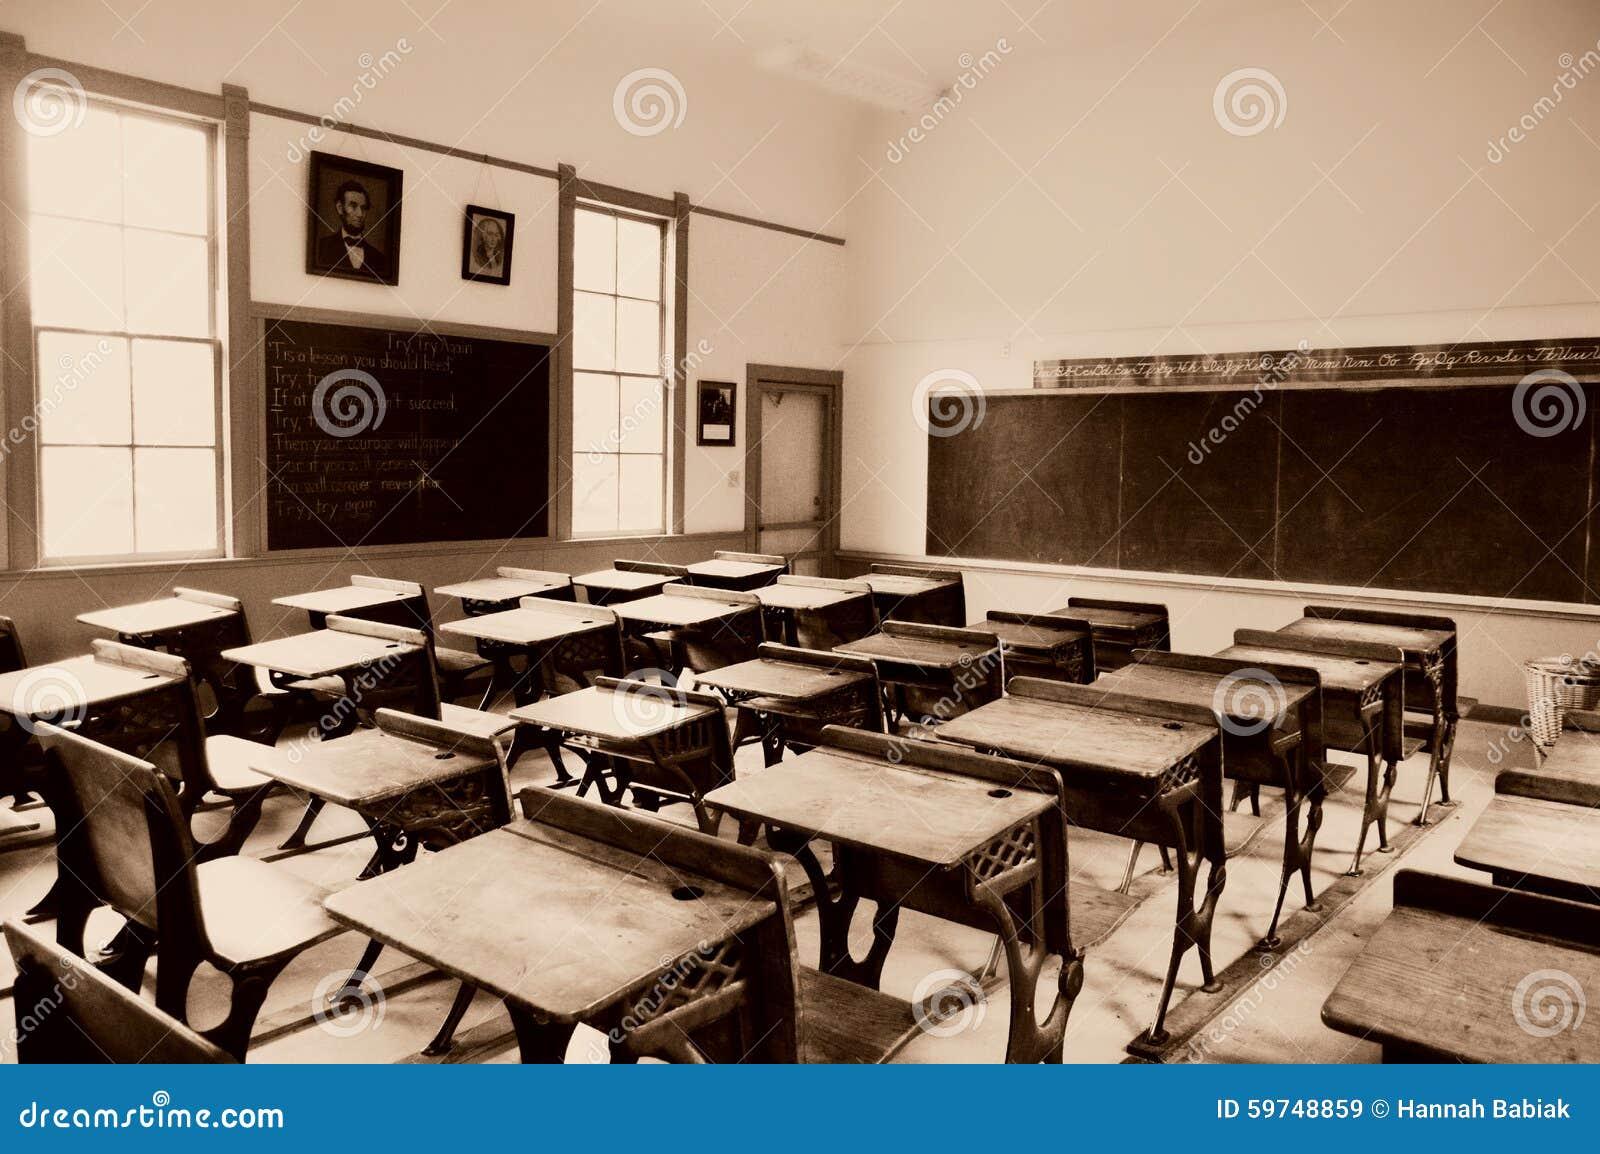 Chalk Board One Room School